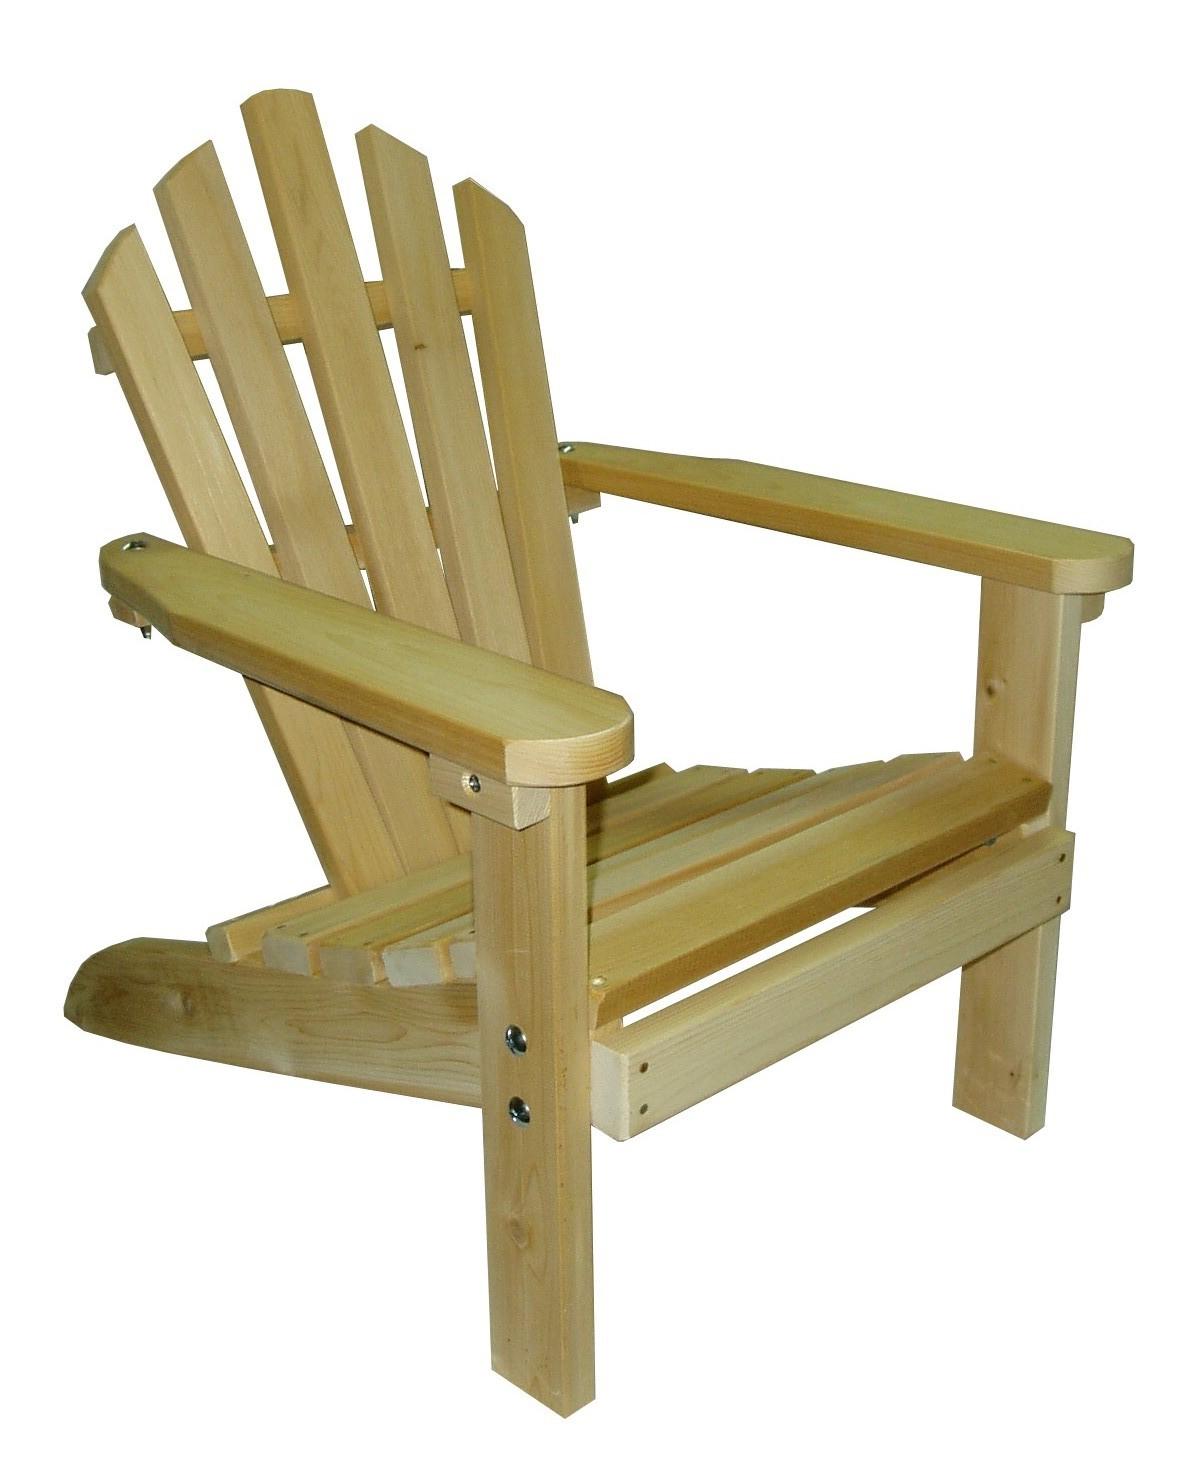 Chair Westport Fauteuil De Muskoka Adirondack Jardin Bois En ... à Fauteuil De Jardin Enfant